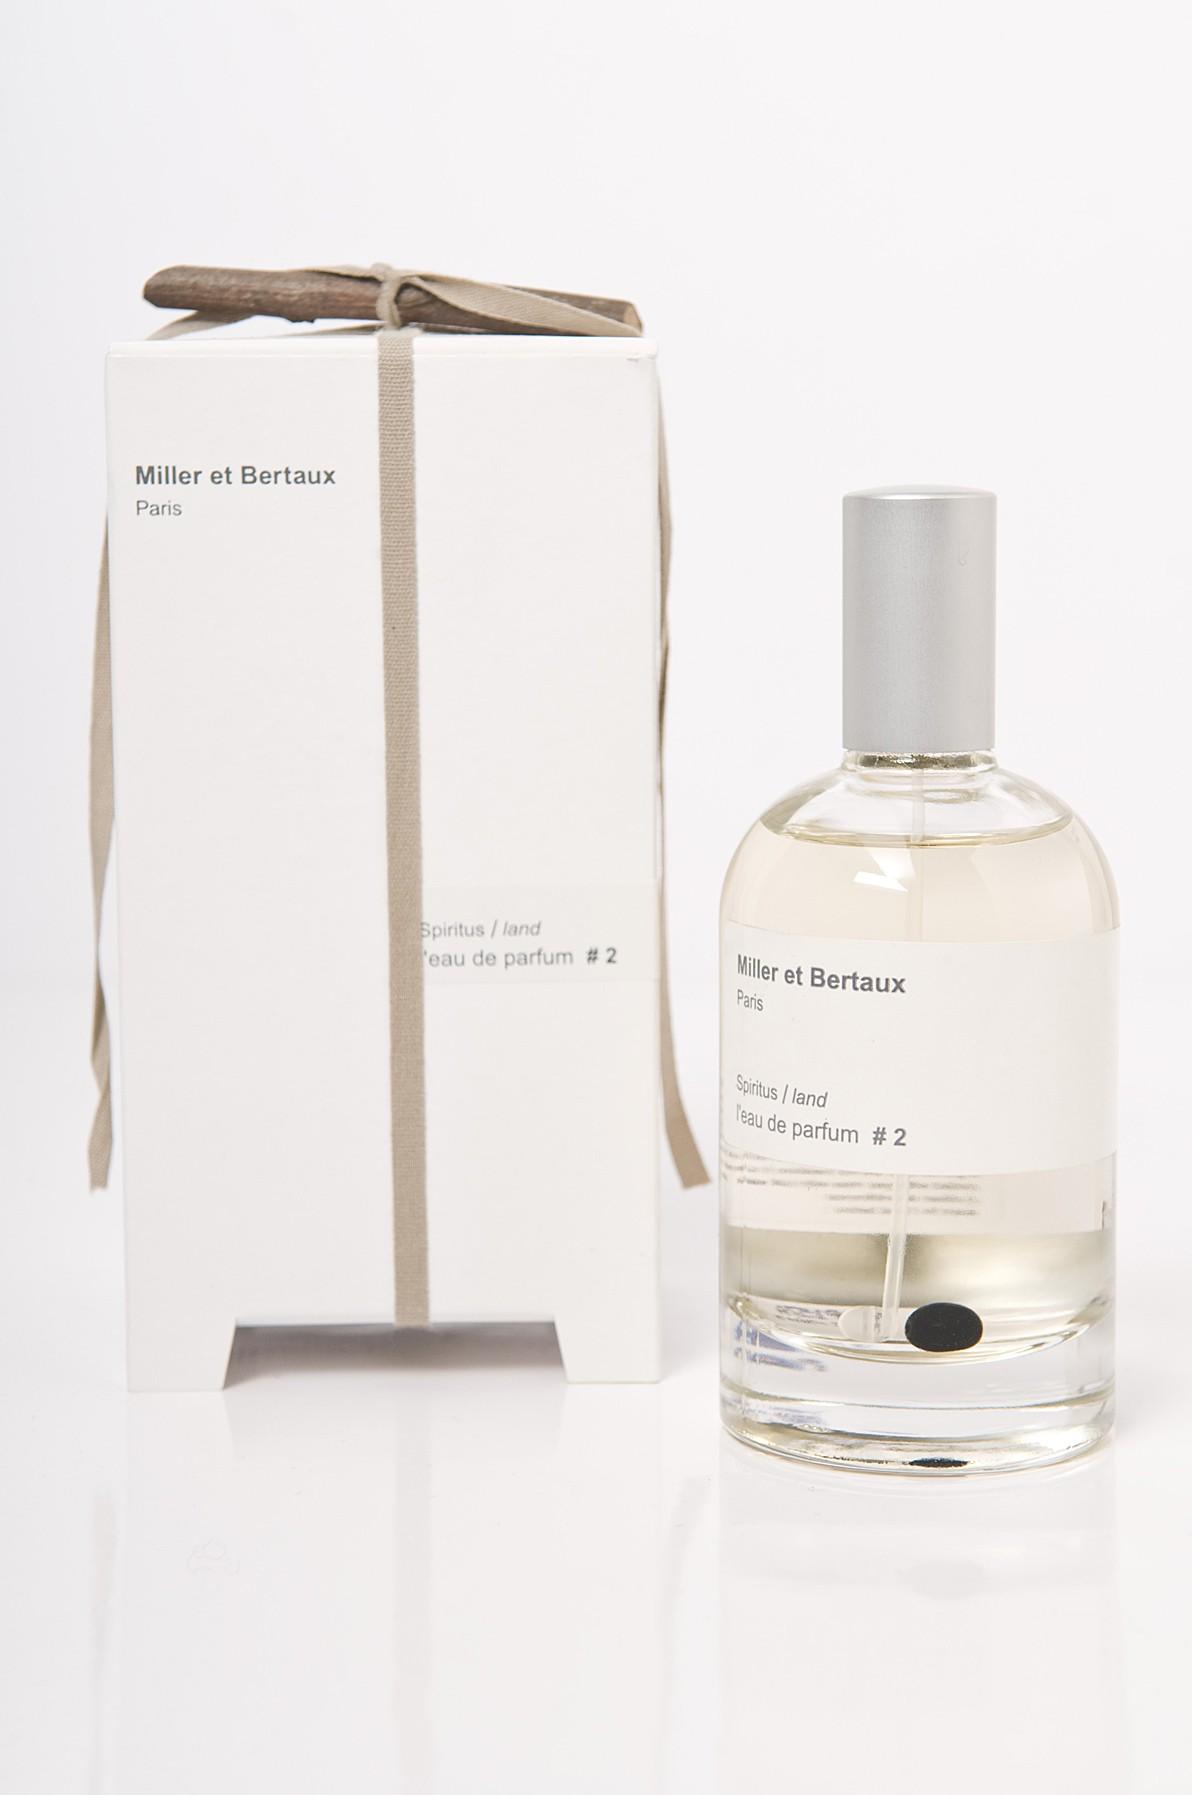 Miller et Bertaux Spiritus / Land #2 аромат для мужчин и женщин